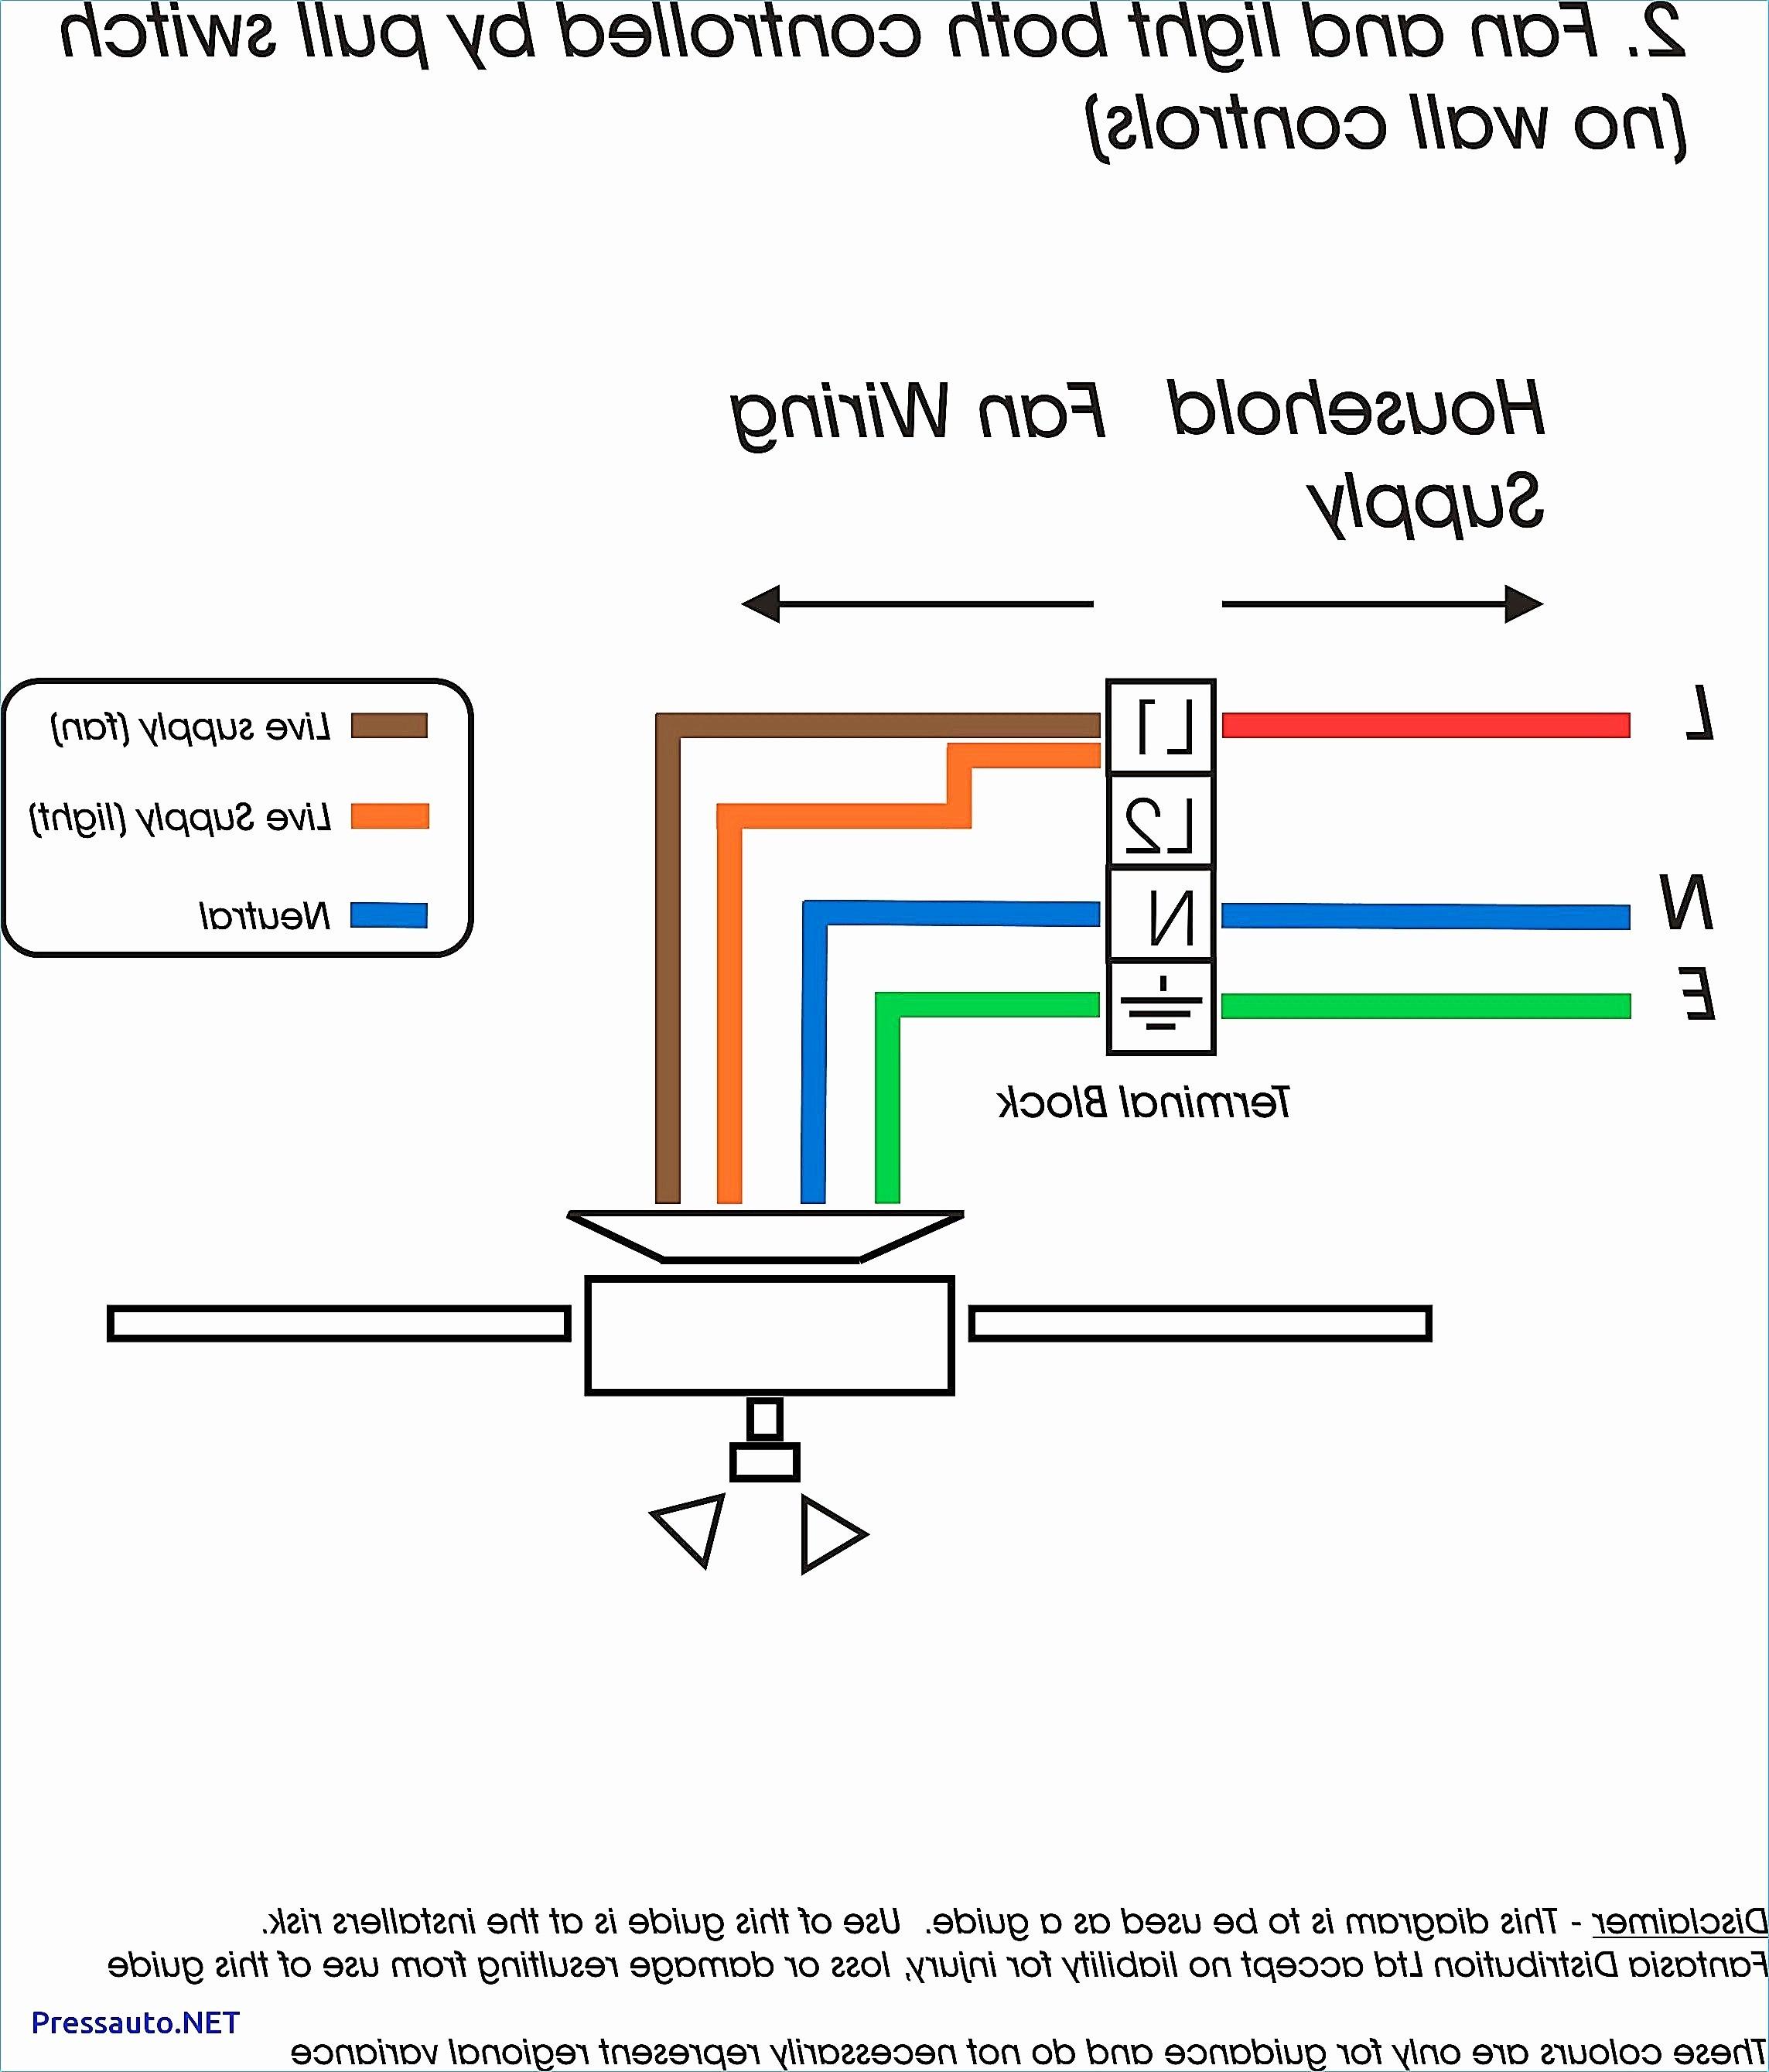 kohler ignition switch wiring diagram wiring diagram image kohler command ignition wiring kohler engine wiring diagram inspirational wiring diagram lawn mower